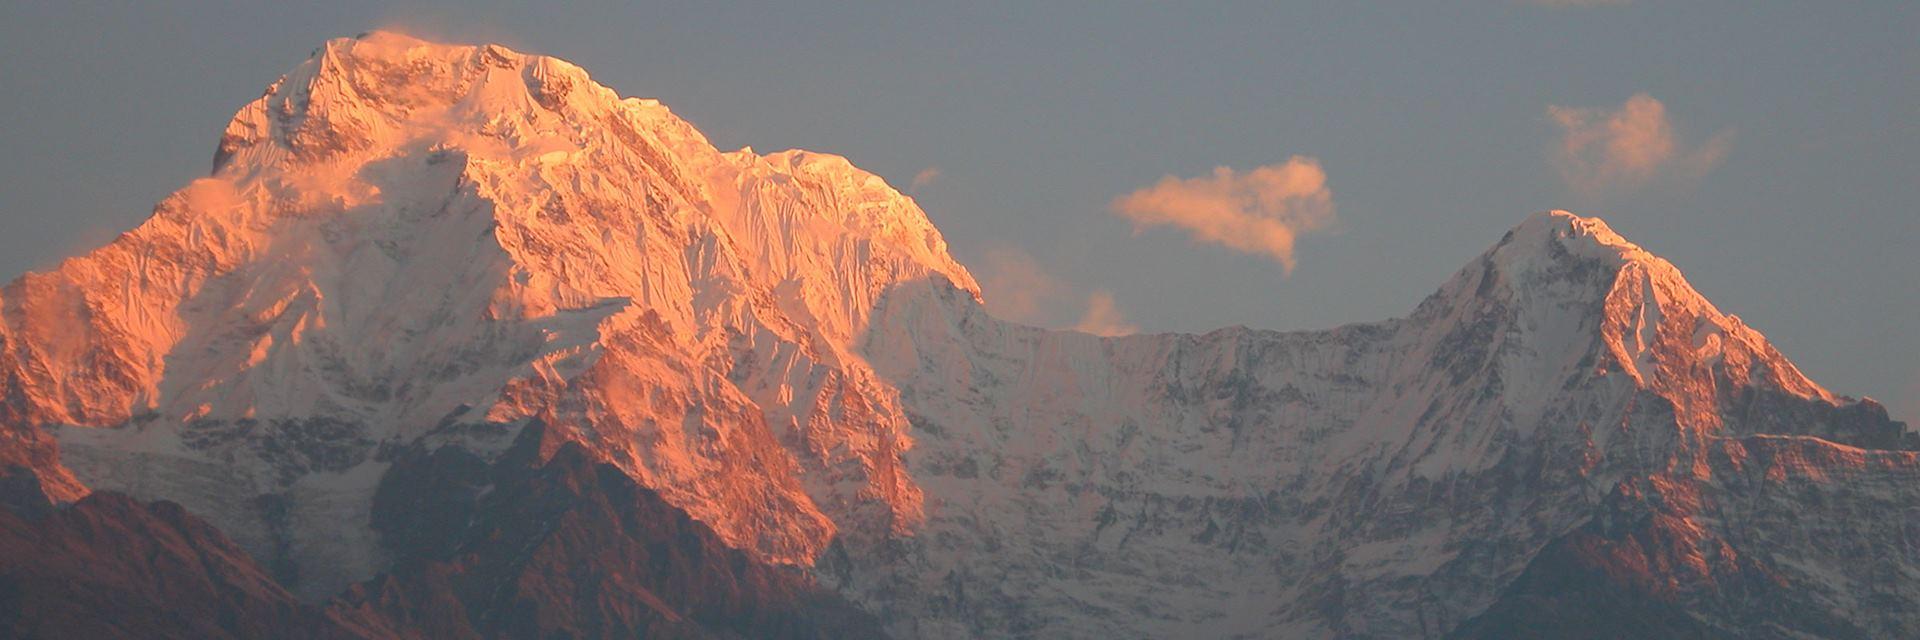 Sunrise from Gurung Lodge, Annapurna, Nepal